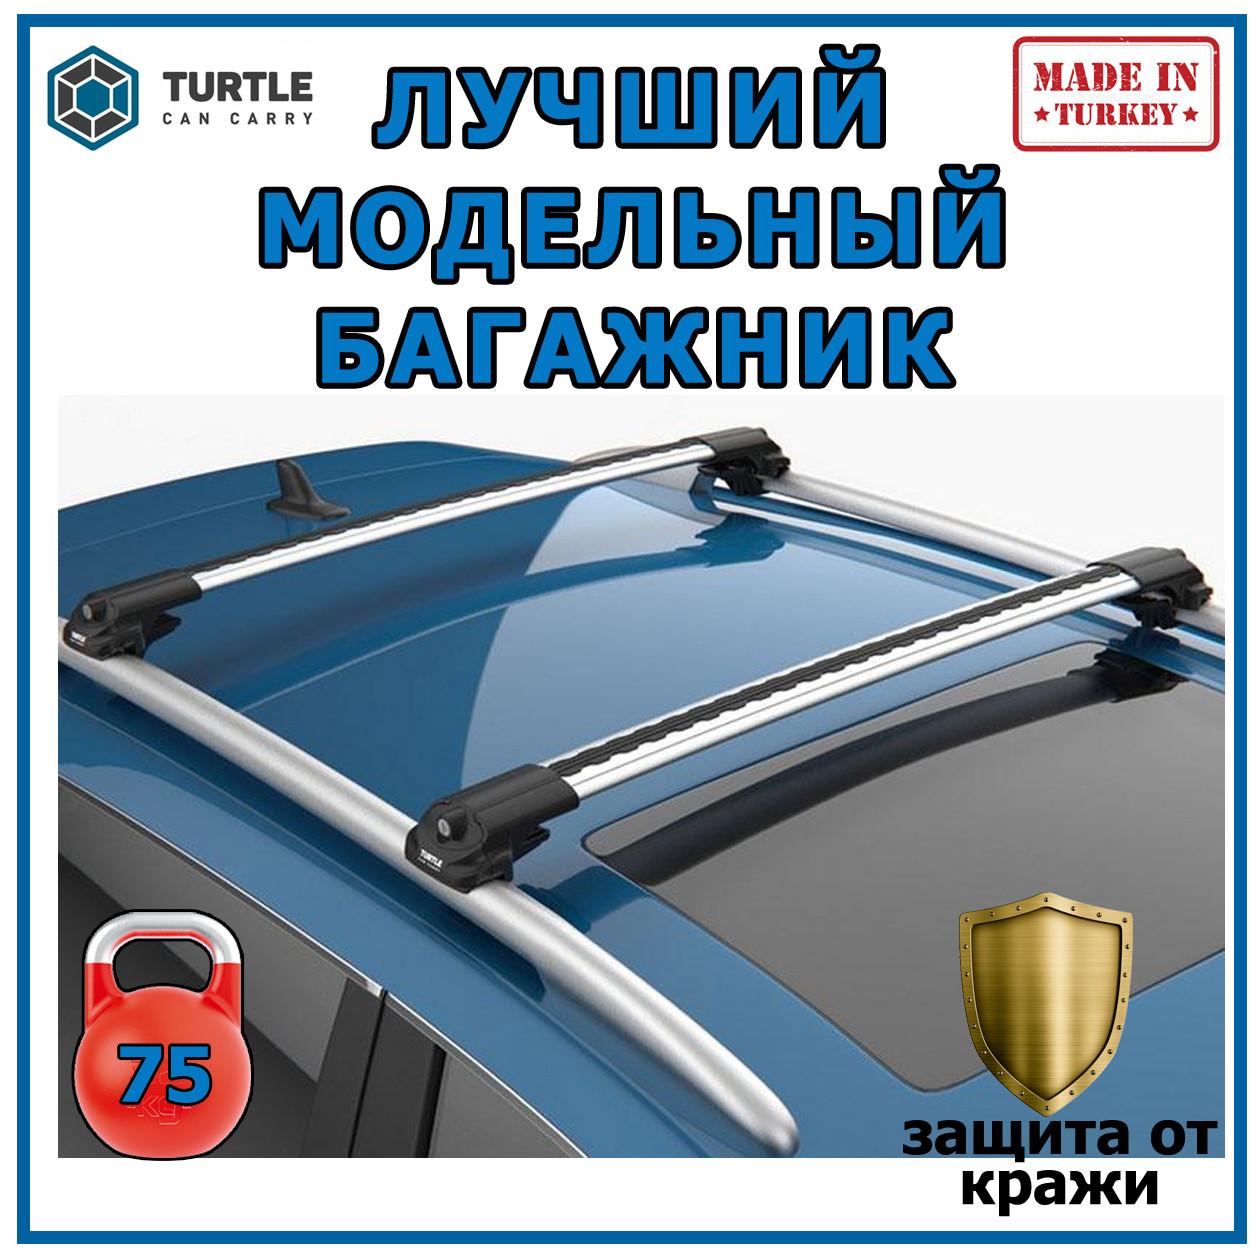 Багажник на дах Mitsubishi Endeavor 2002-2011 на рейлінги сірий Turtle